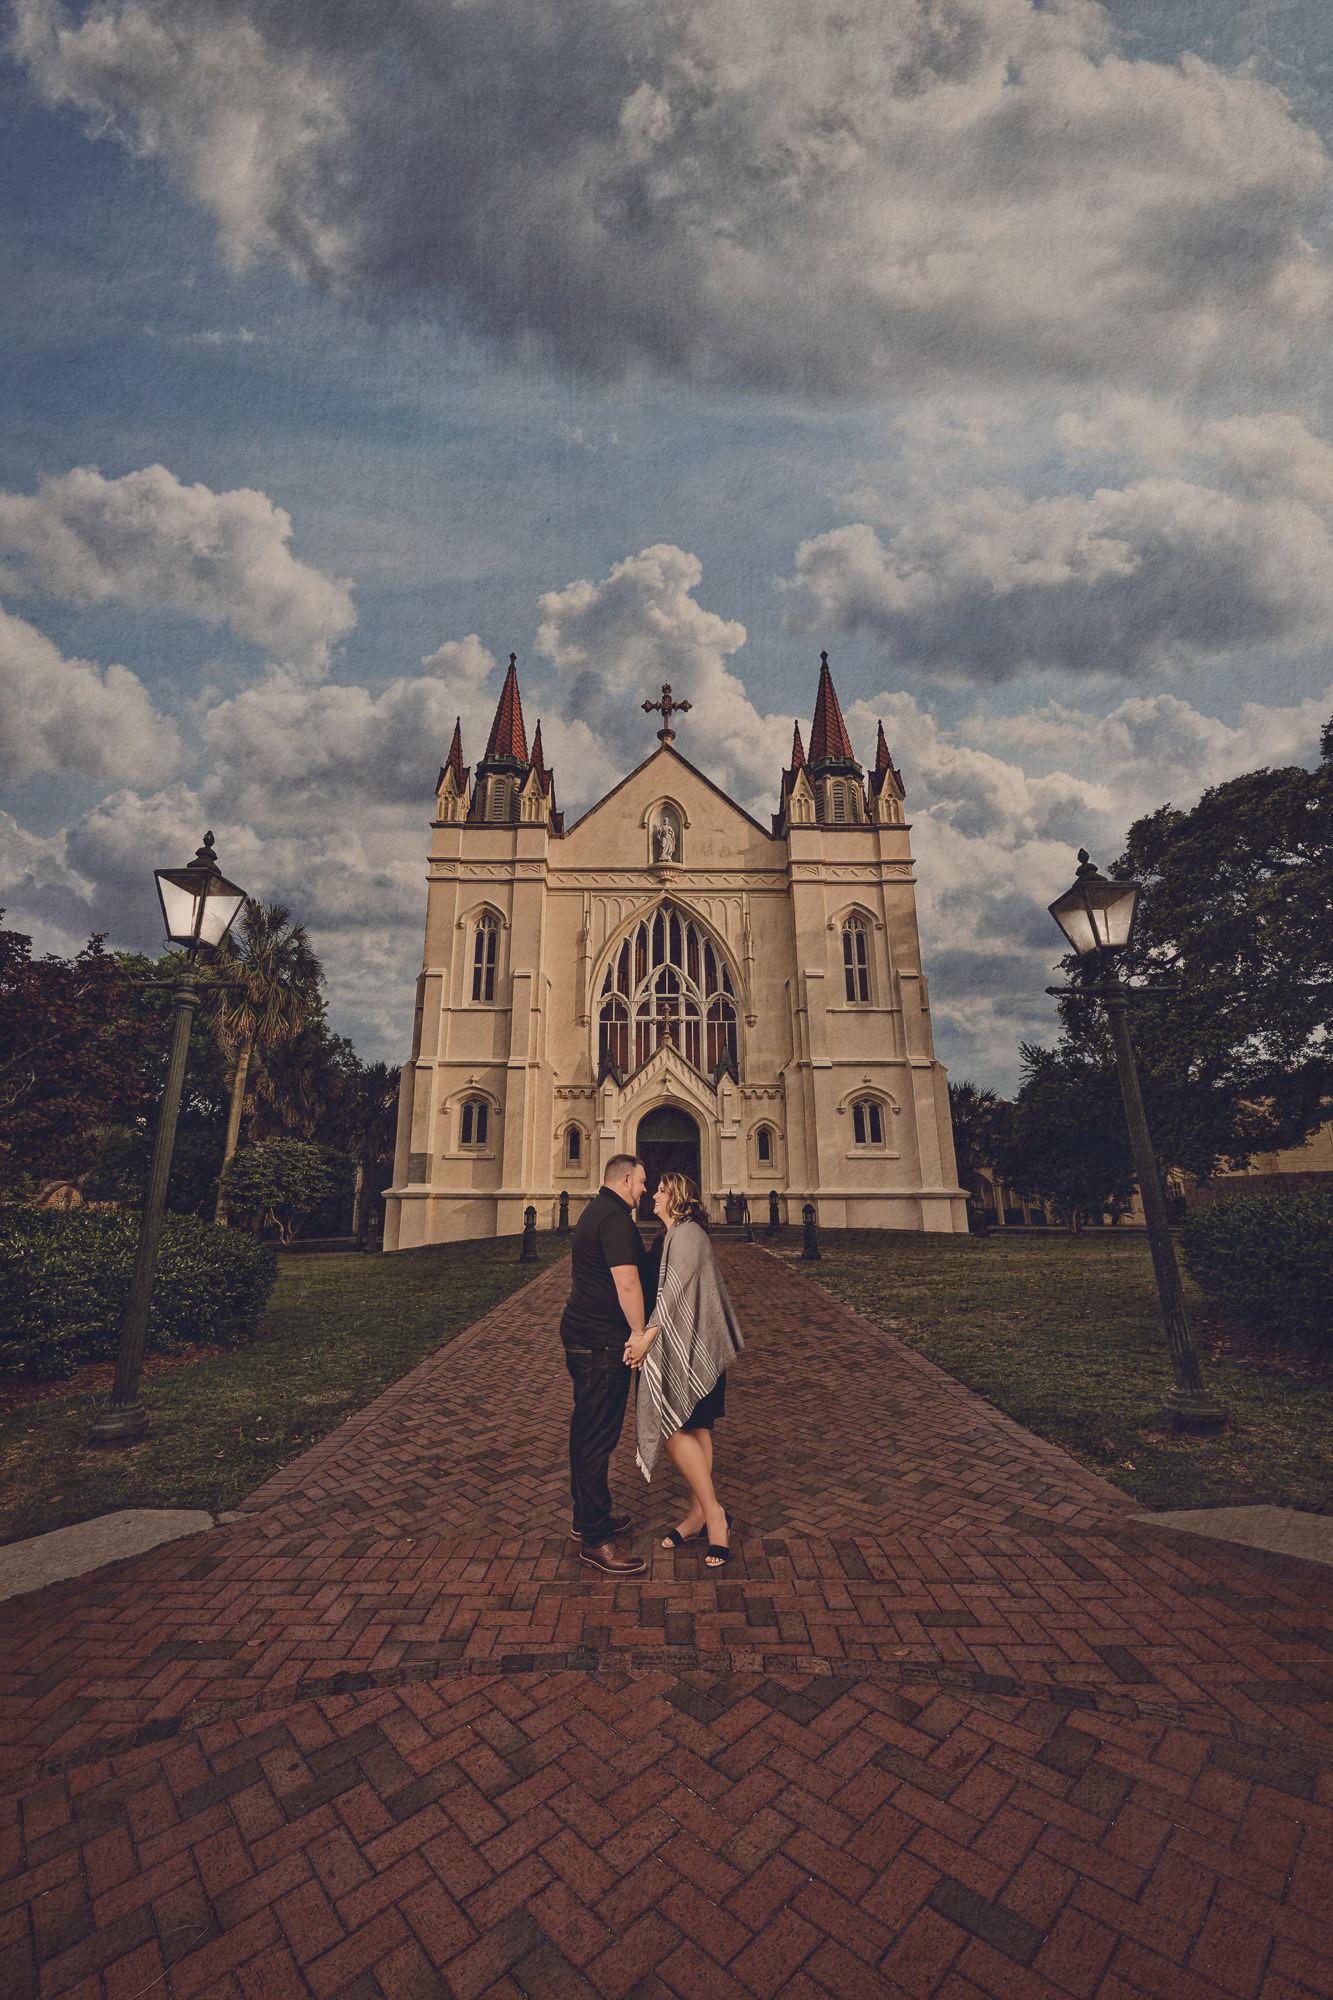 zachdalinphotography-wedding-17.jpg